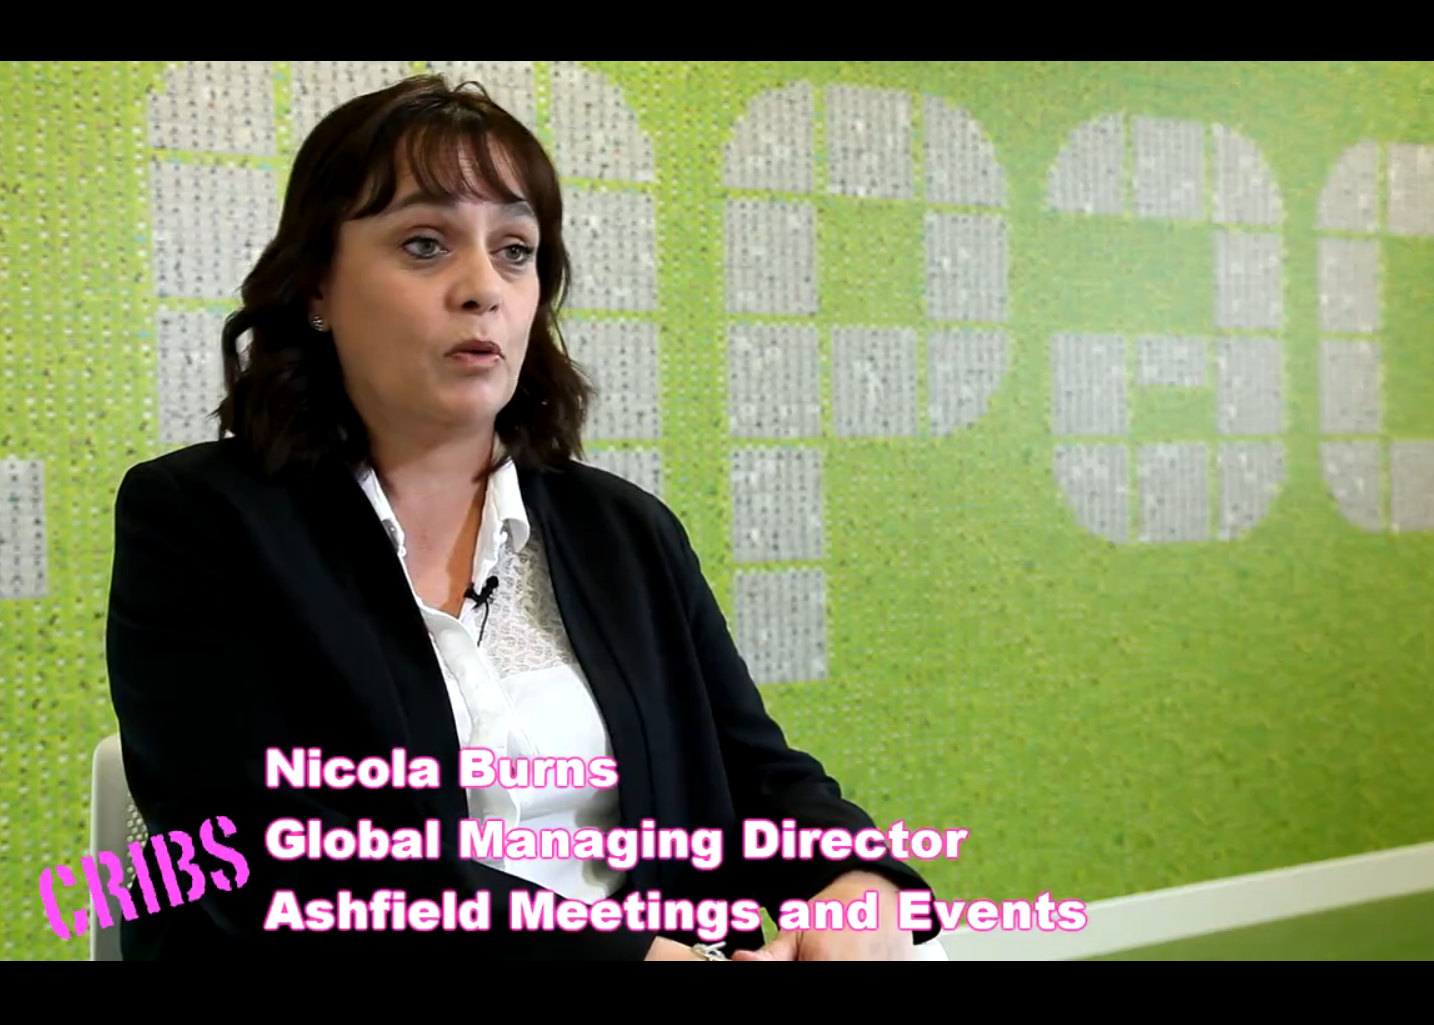 C&IT Agency Cribs: Ashfield Meetings & Events